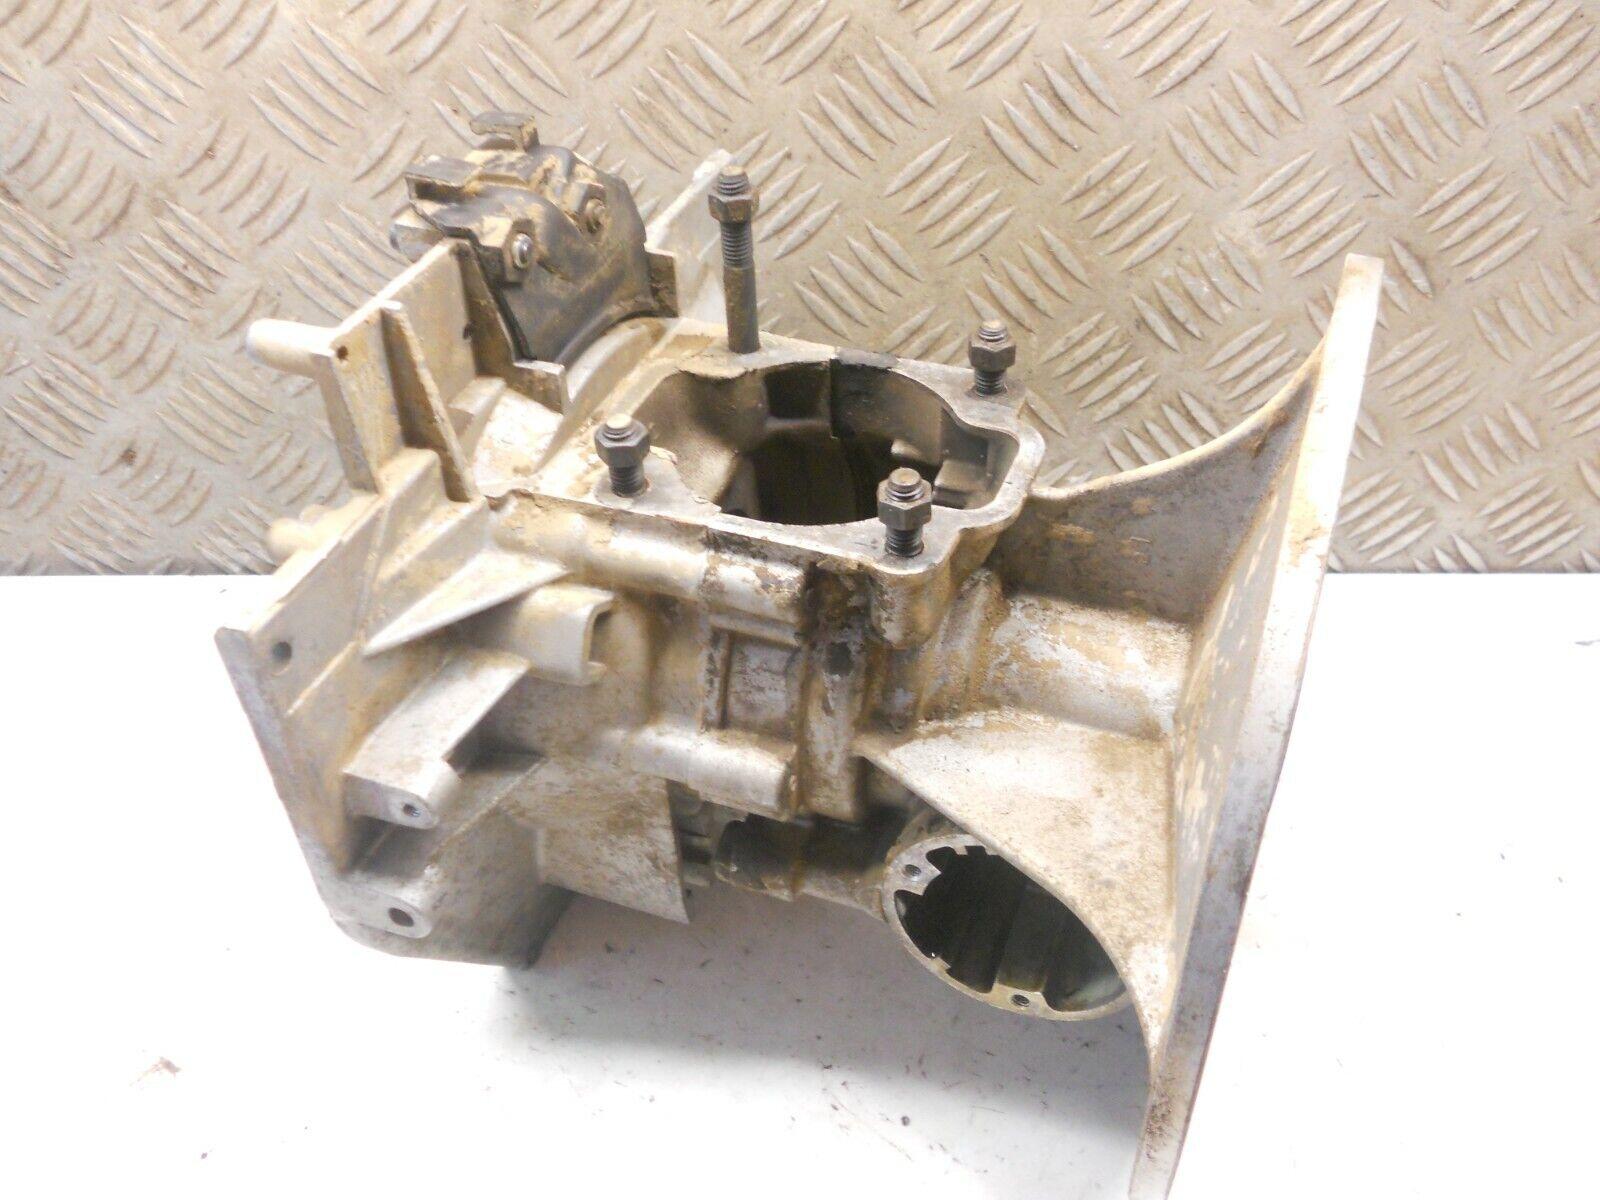 Sachs Sb 151   Wolf Eurojoondor - Cubiertas Motor Ref.0911208399 & 0911205599